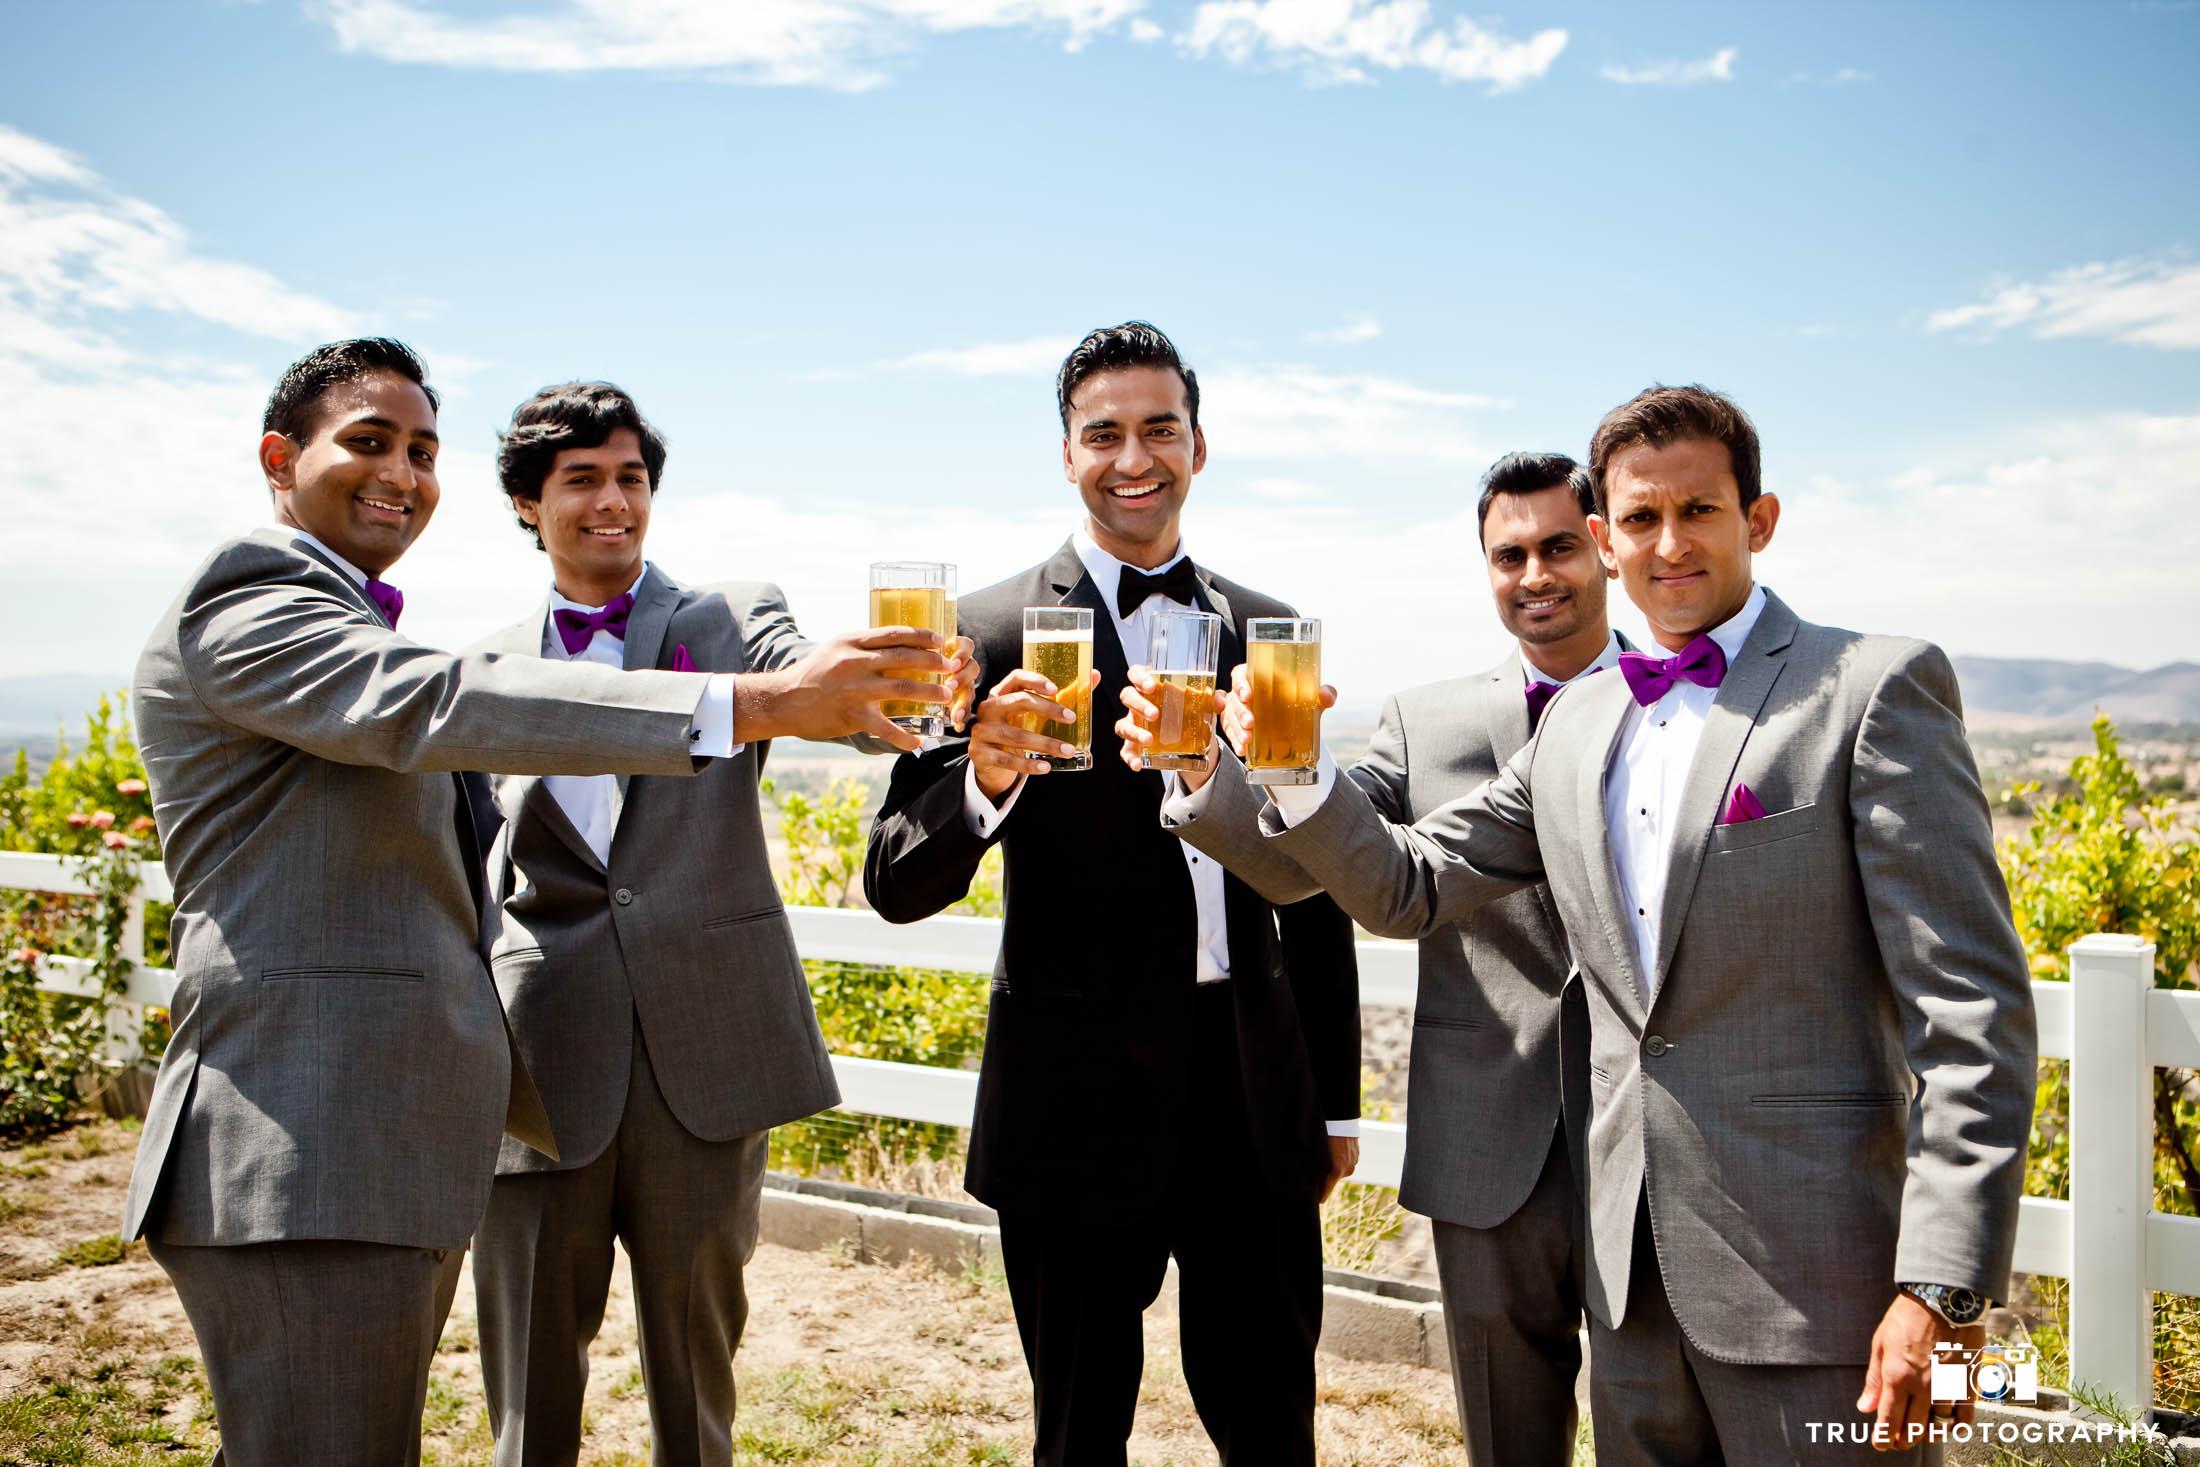 Groomsmen toast with beers